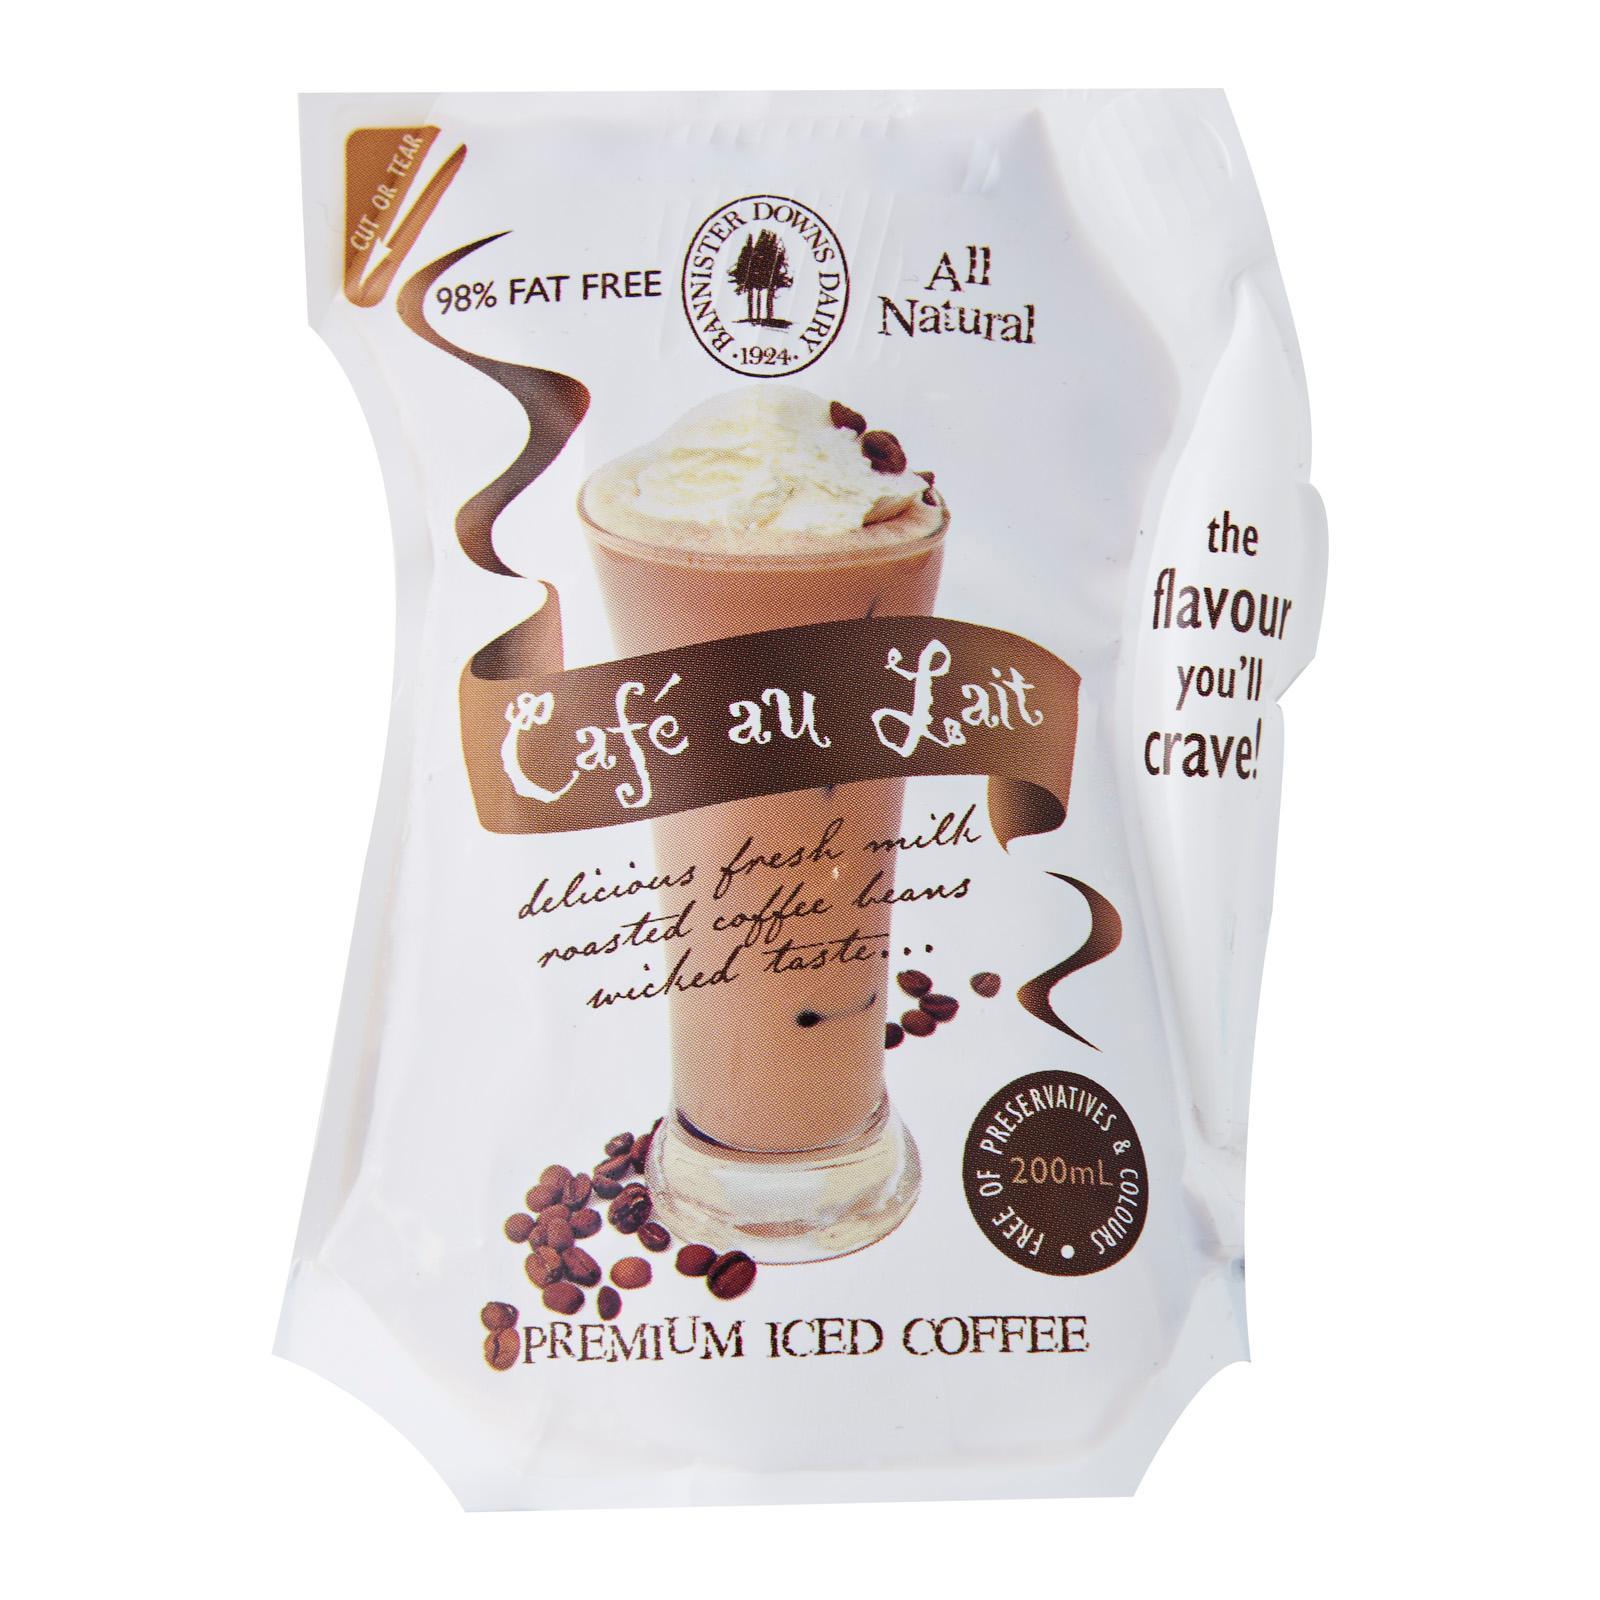 Bannister Downs Cafe au Lait Fresh Coffee Milk - Australia - 200mL